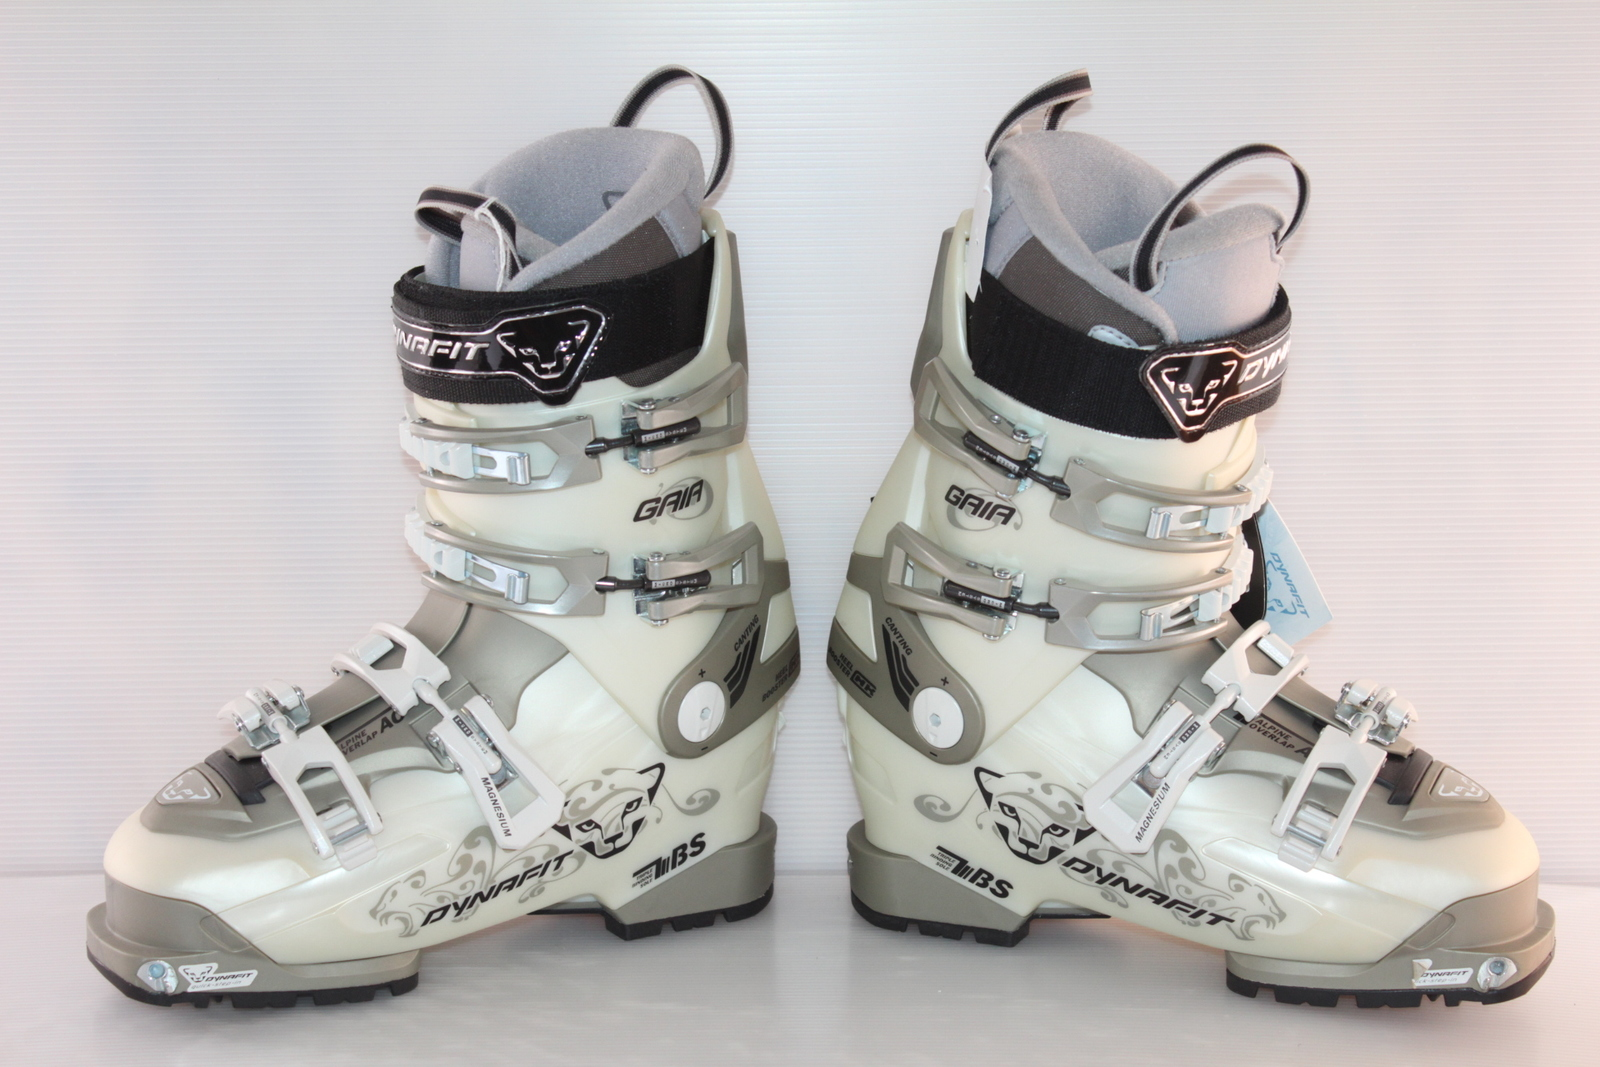 Dámské skialpové boty Dynafit Gaia FX - skialp vel. EU37